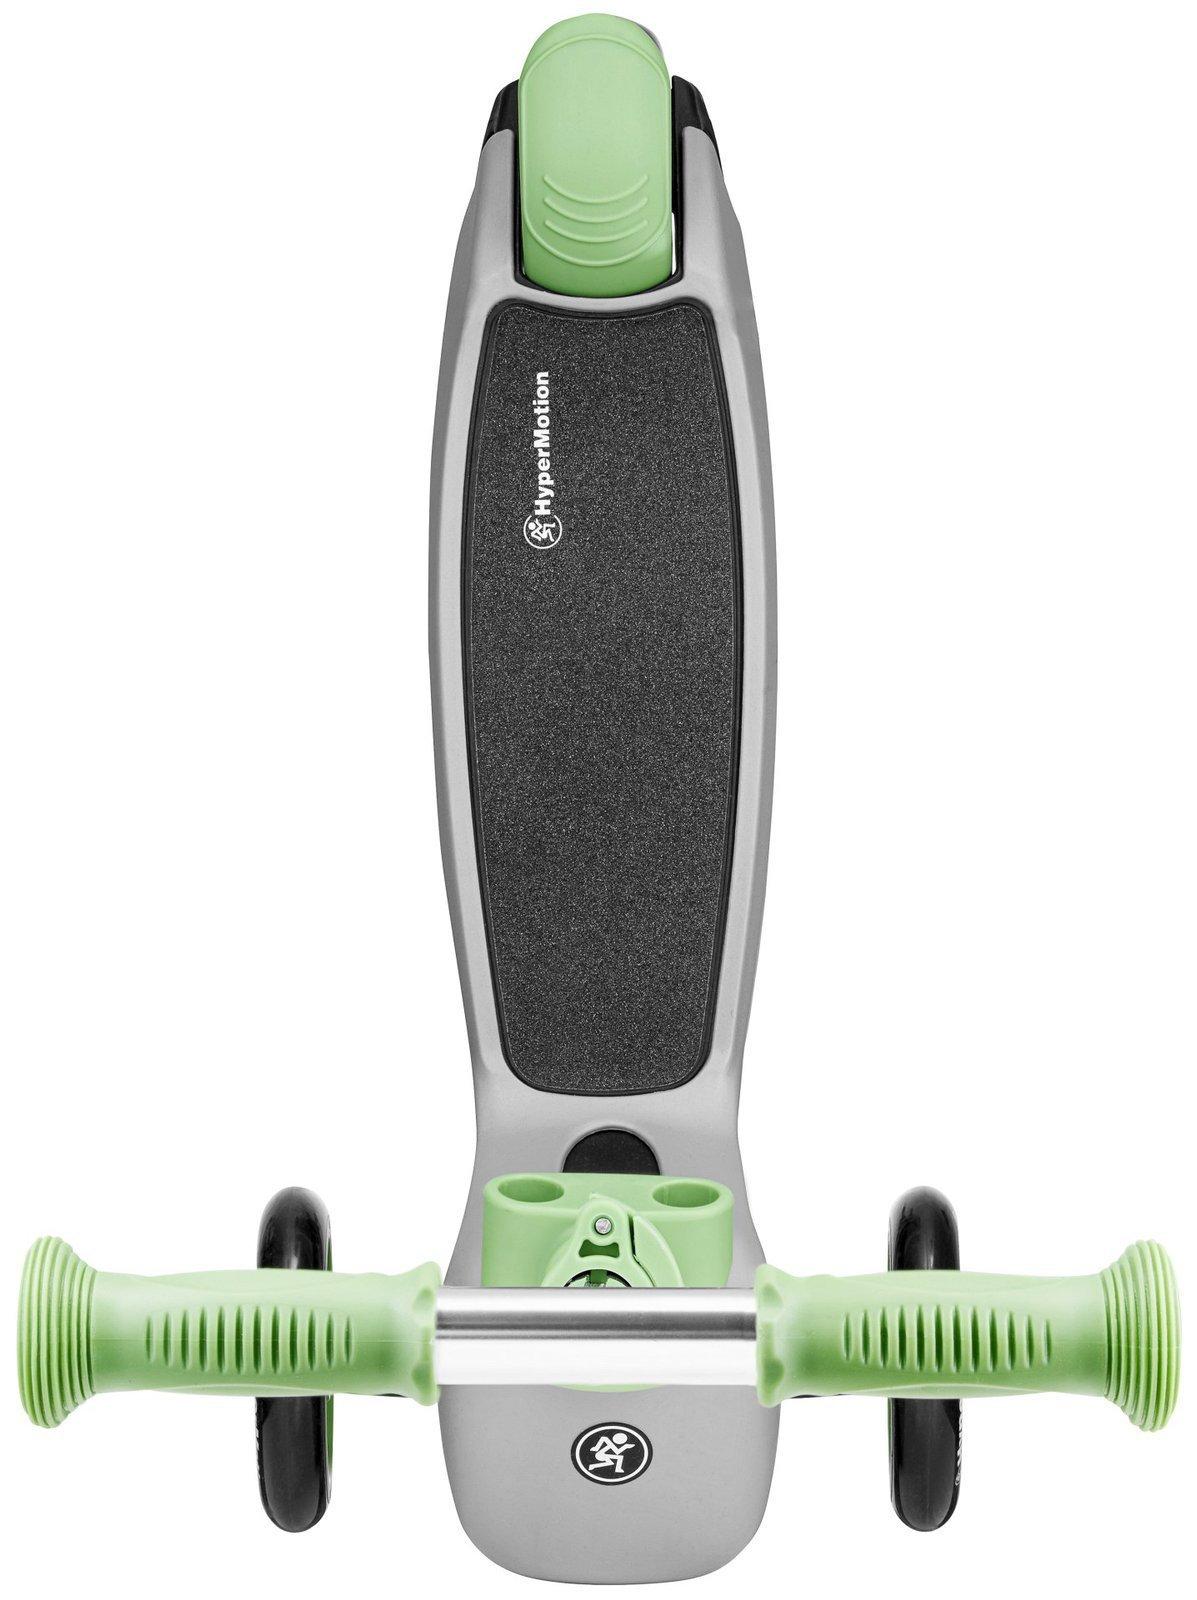 Hulajnoga 3in1 HyperMotion - zielona